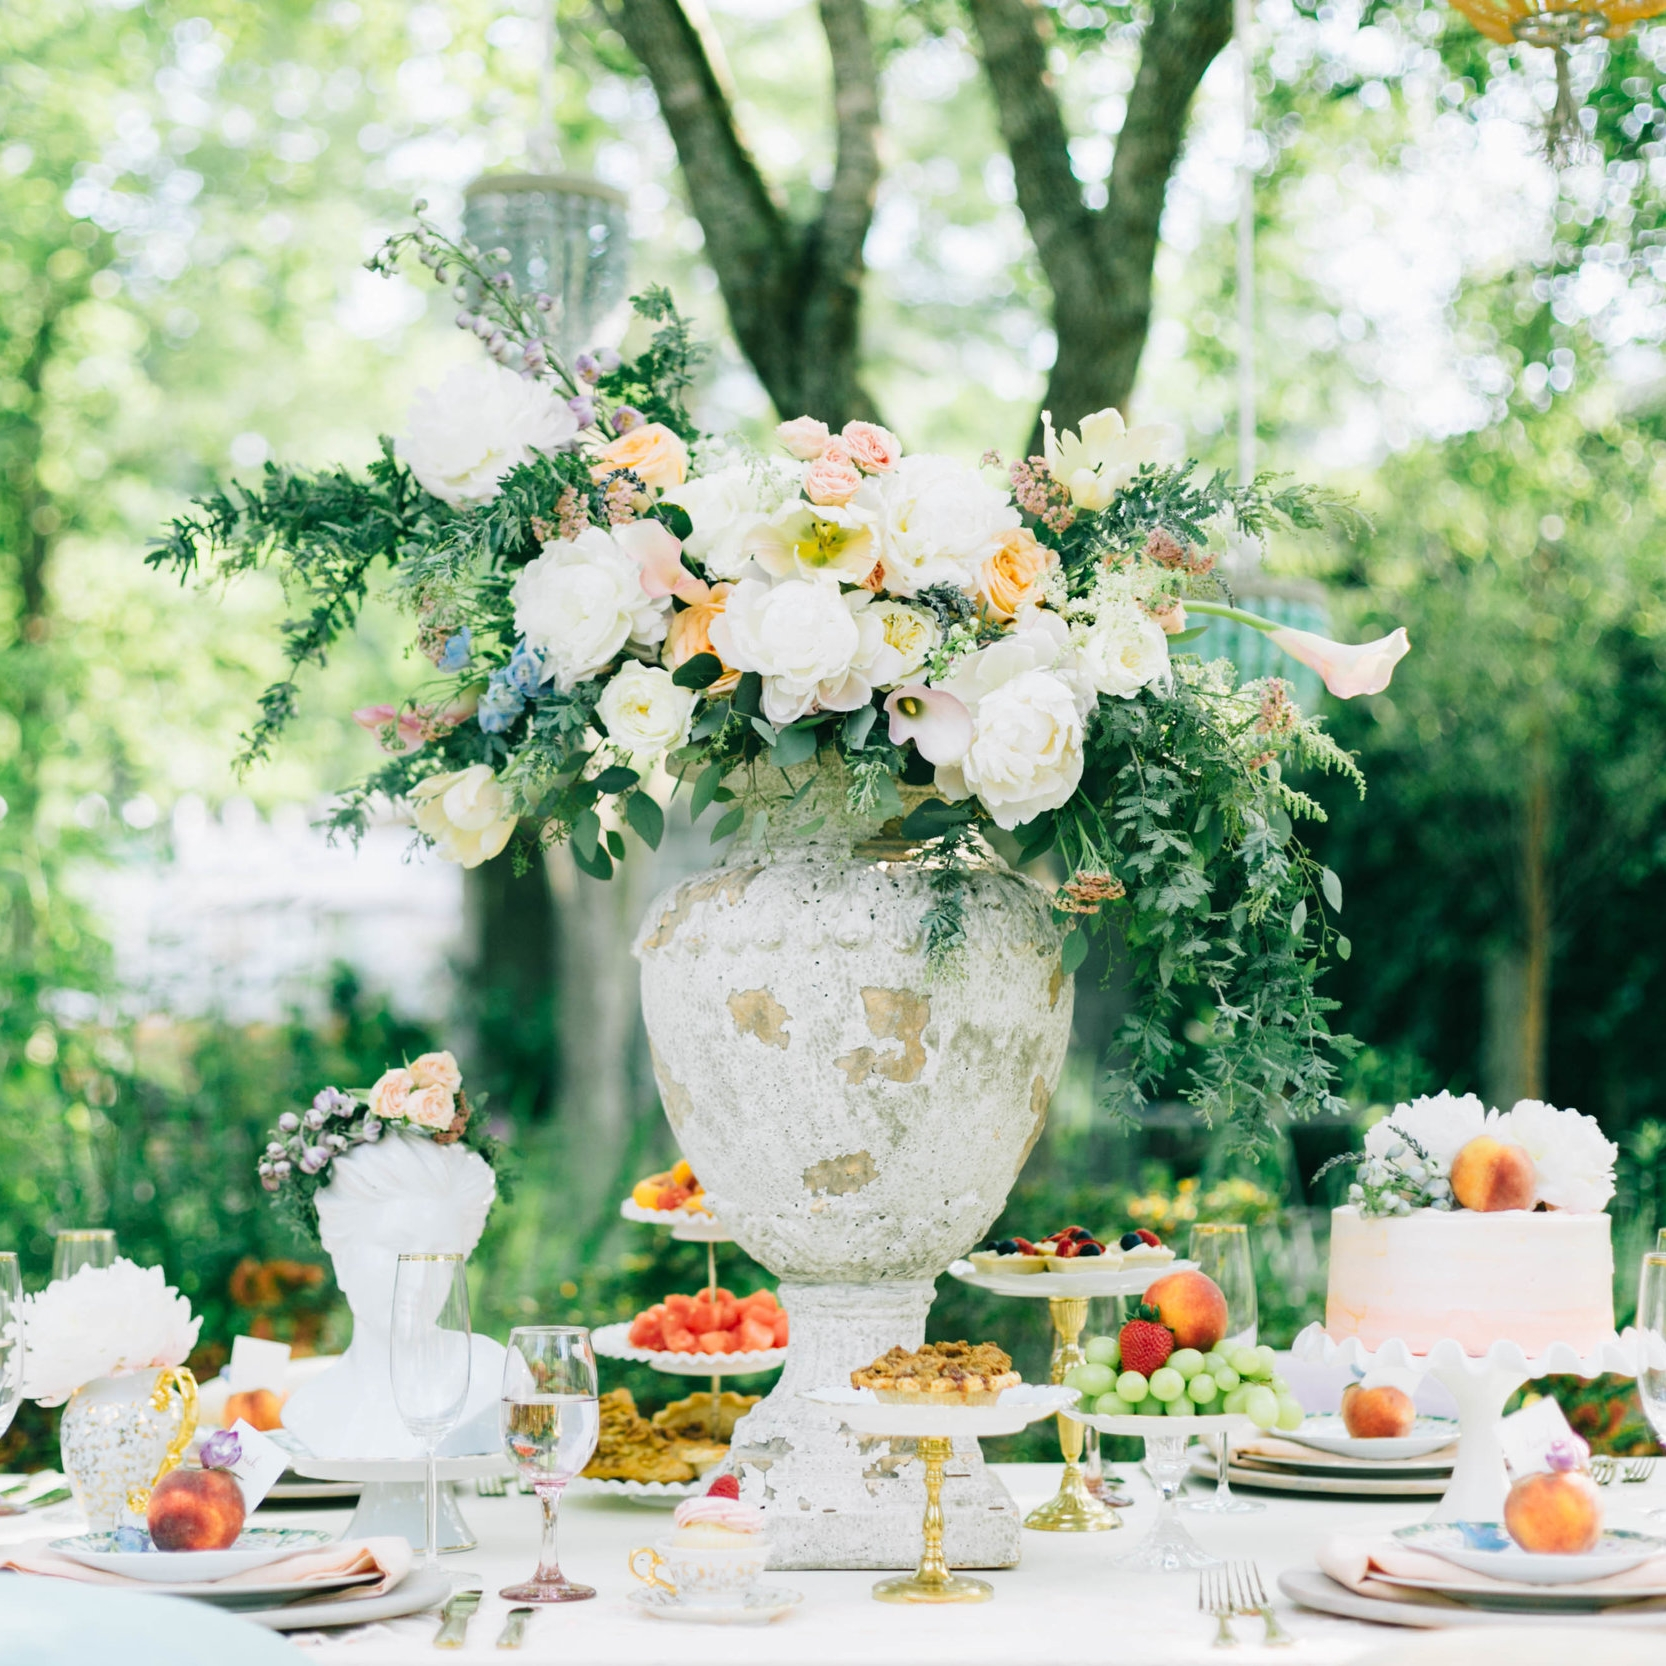 cypress gardens charleston bridal shower wedding planners (56).jpg